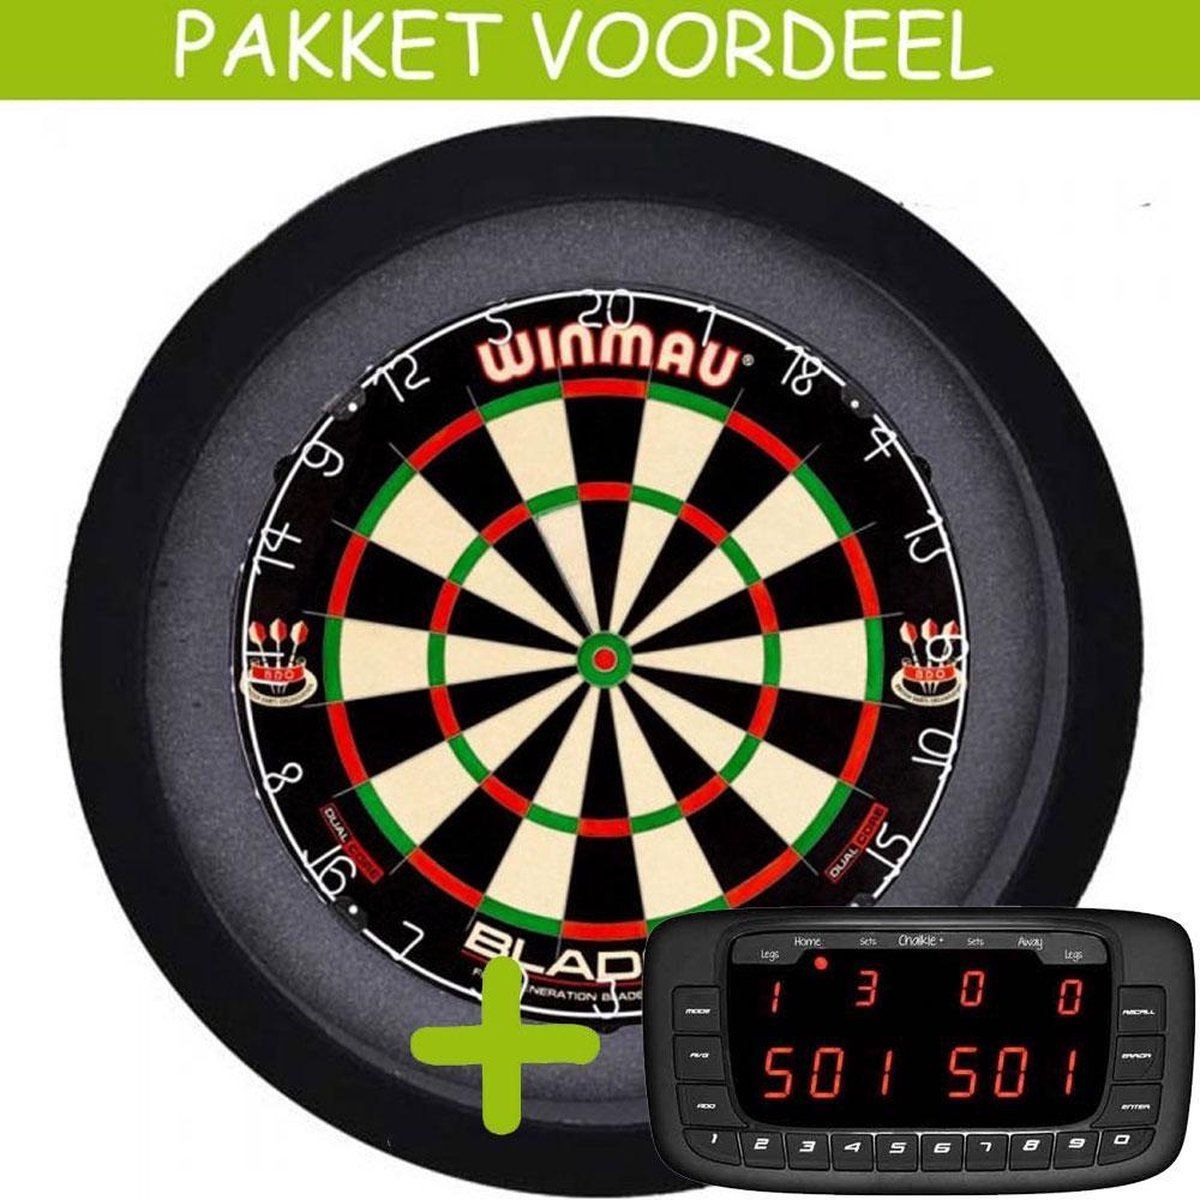 Elektronisch Dart Scorebord VoordeelPakket (Chalkie + ) - Dual Core - Dartbordverlichting Basic (Zwart)